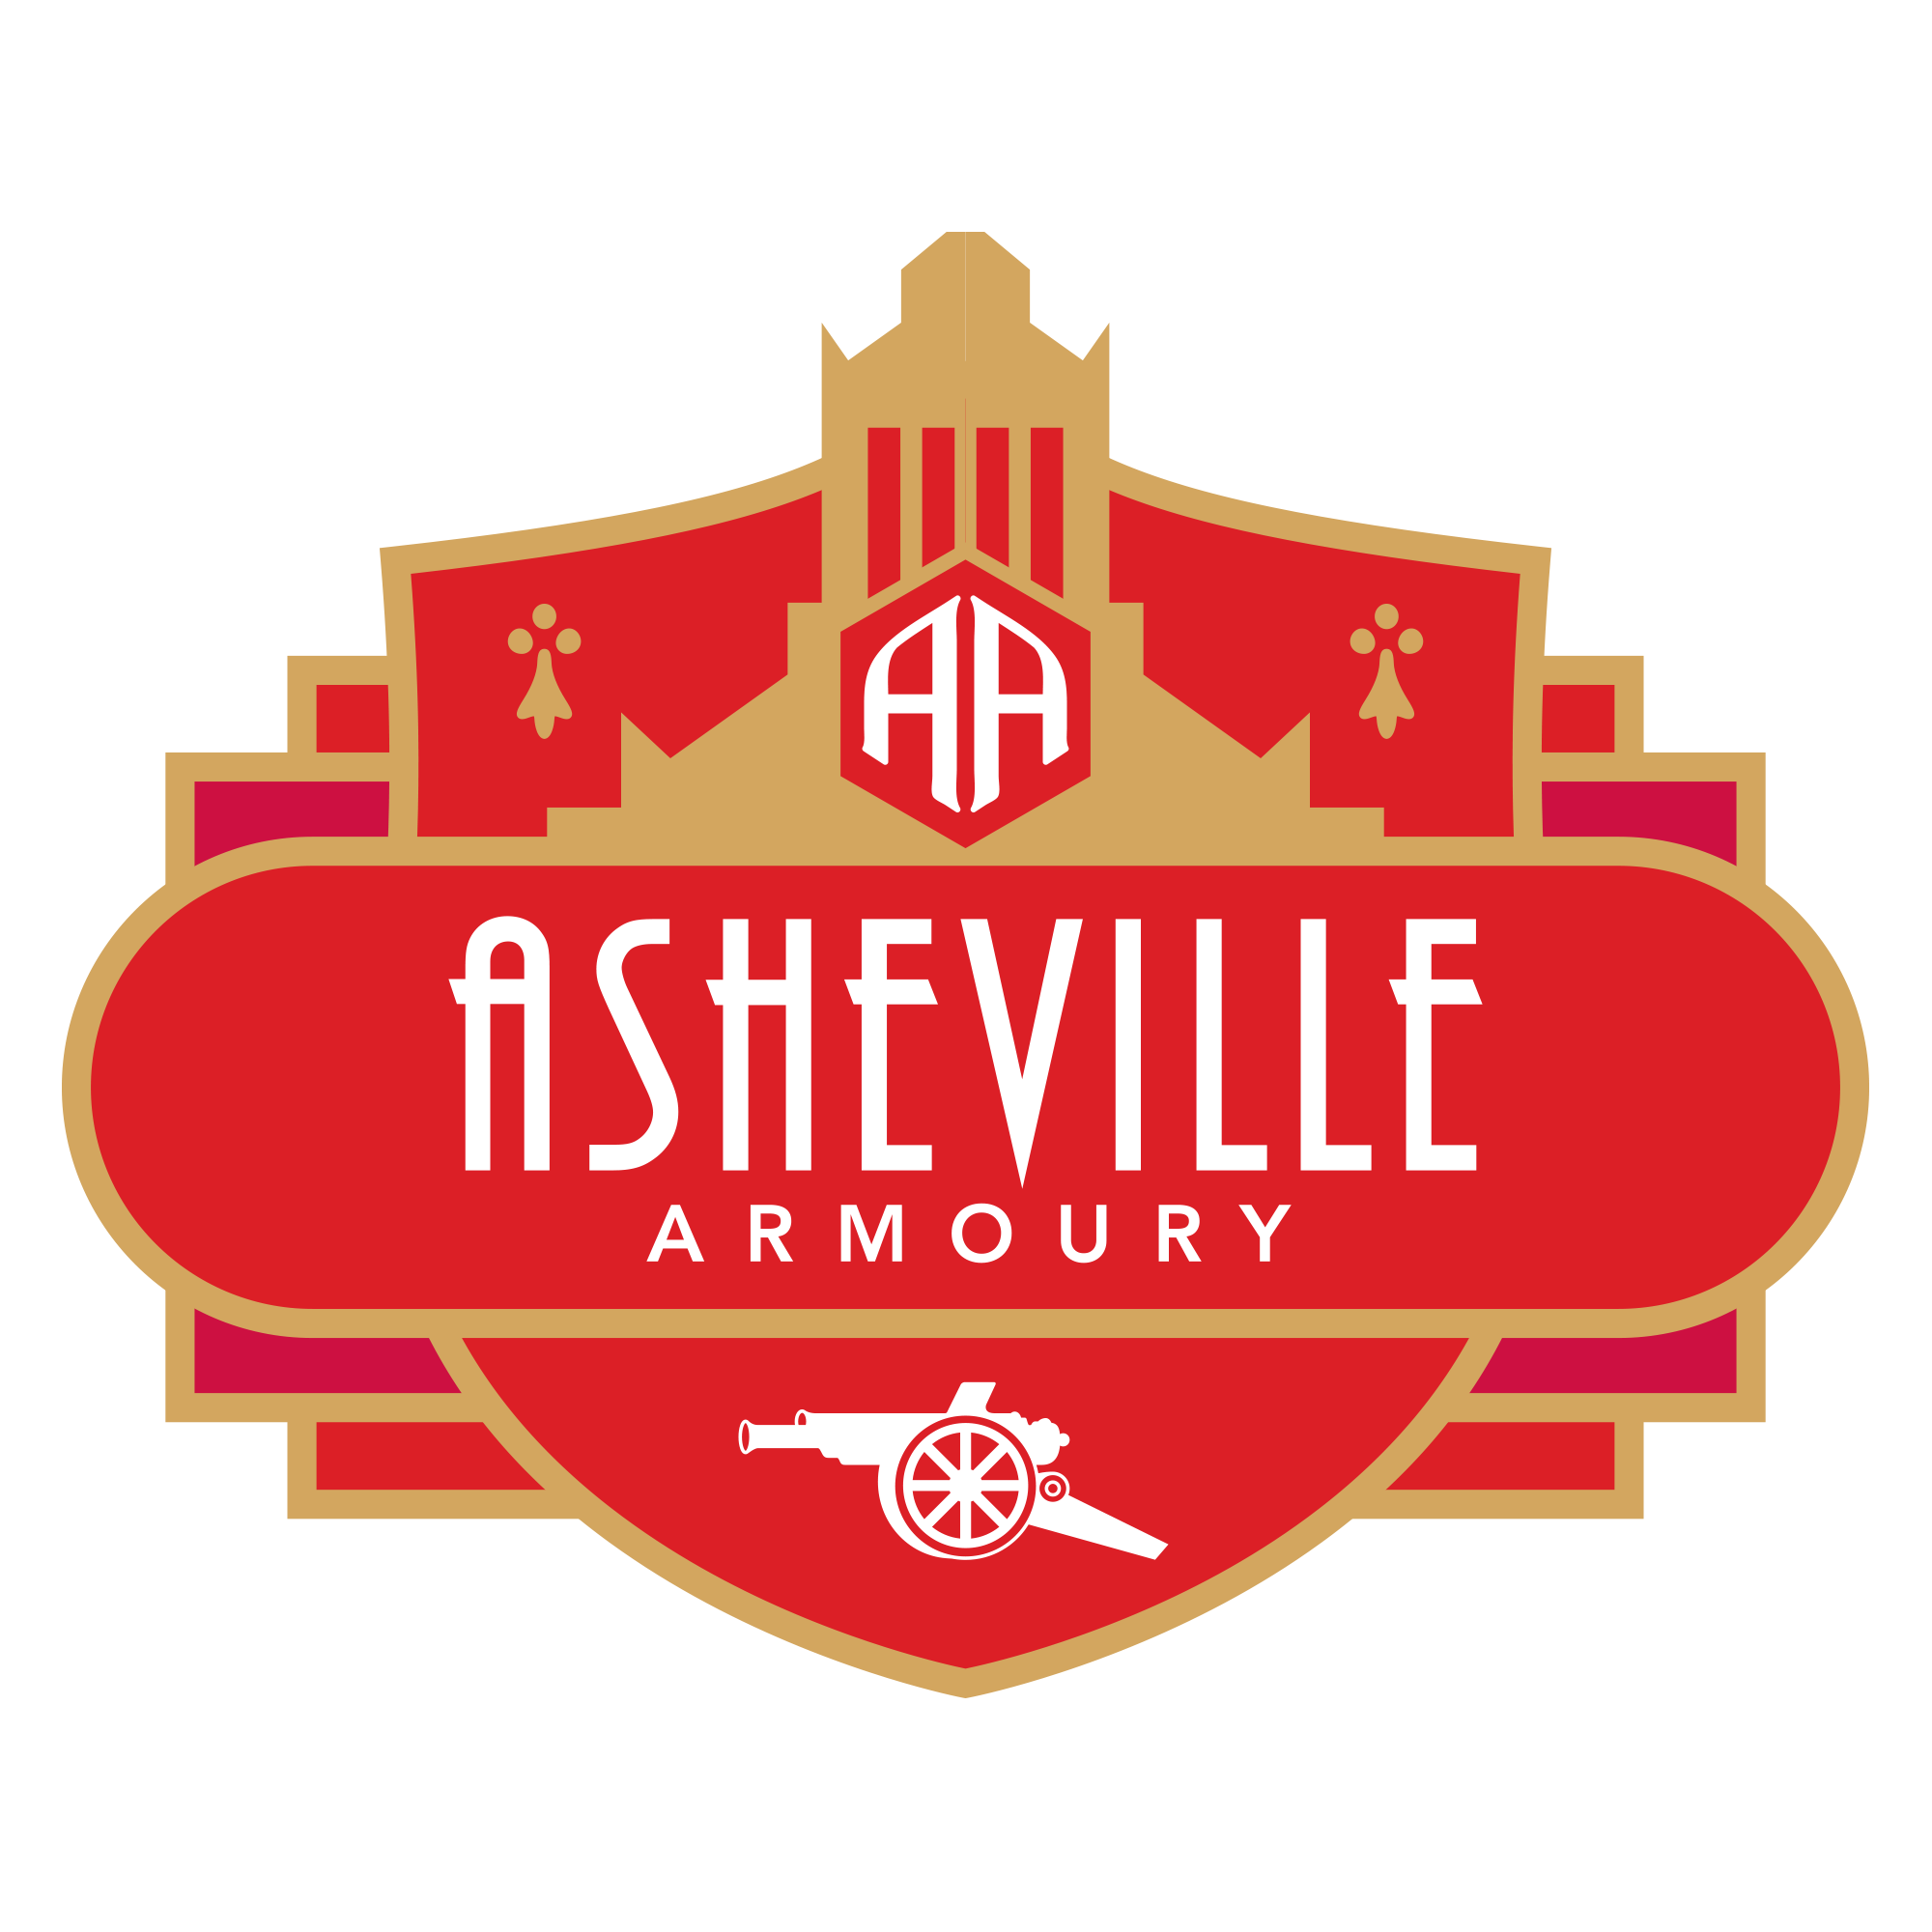 Asheville Armoury